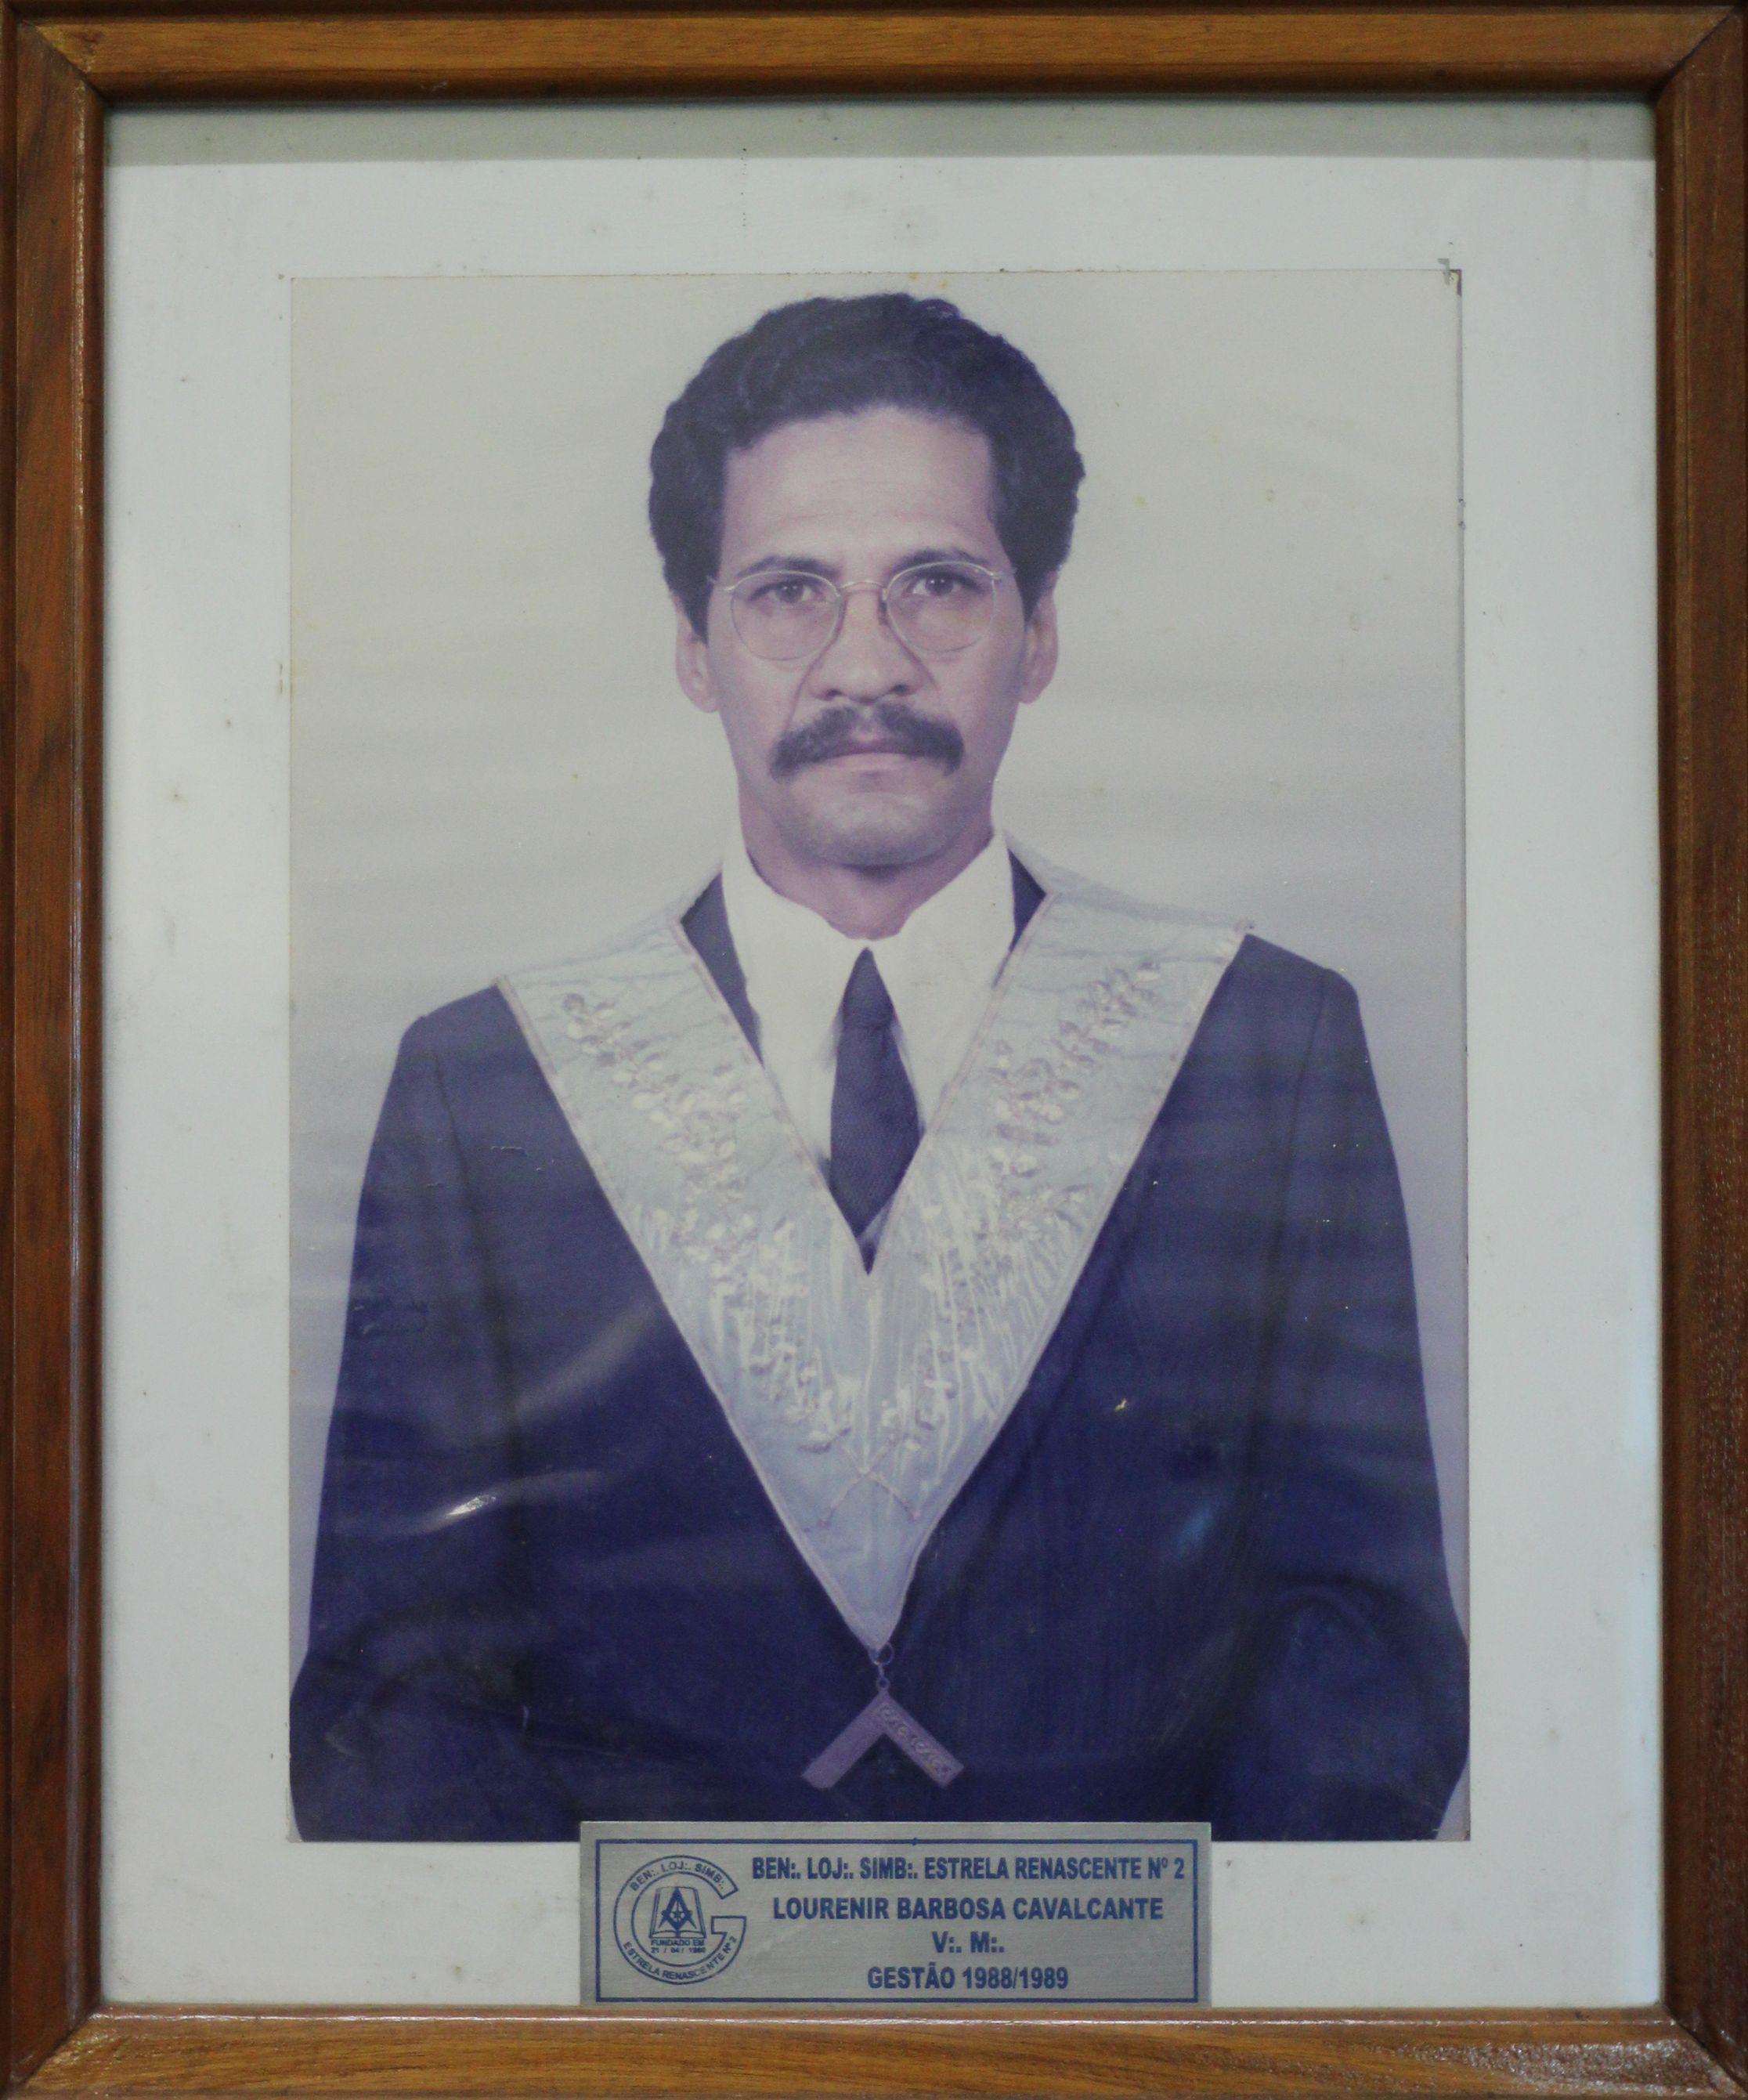 Lourenir Barbosa Cavalcante - 88/89